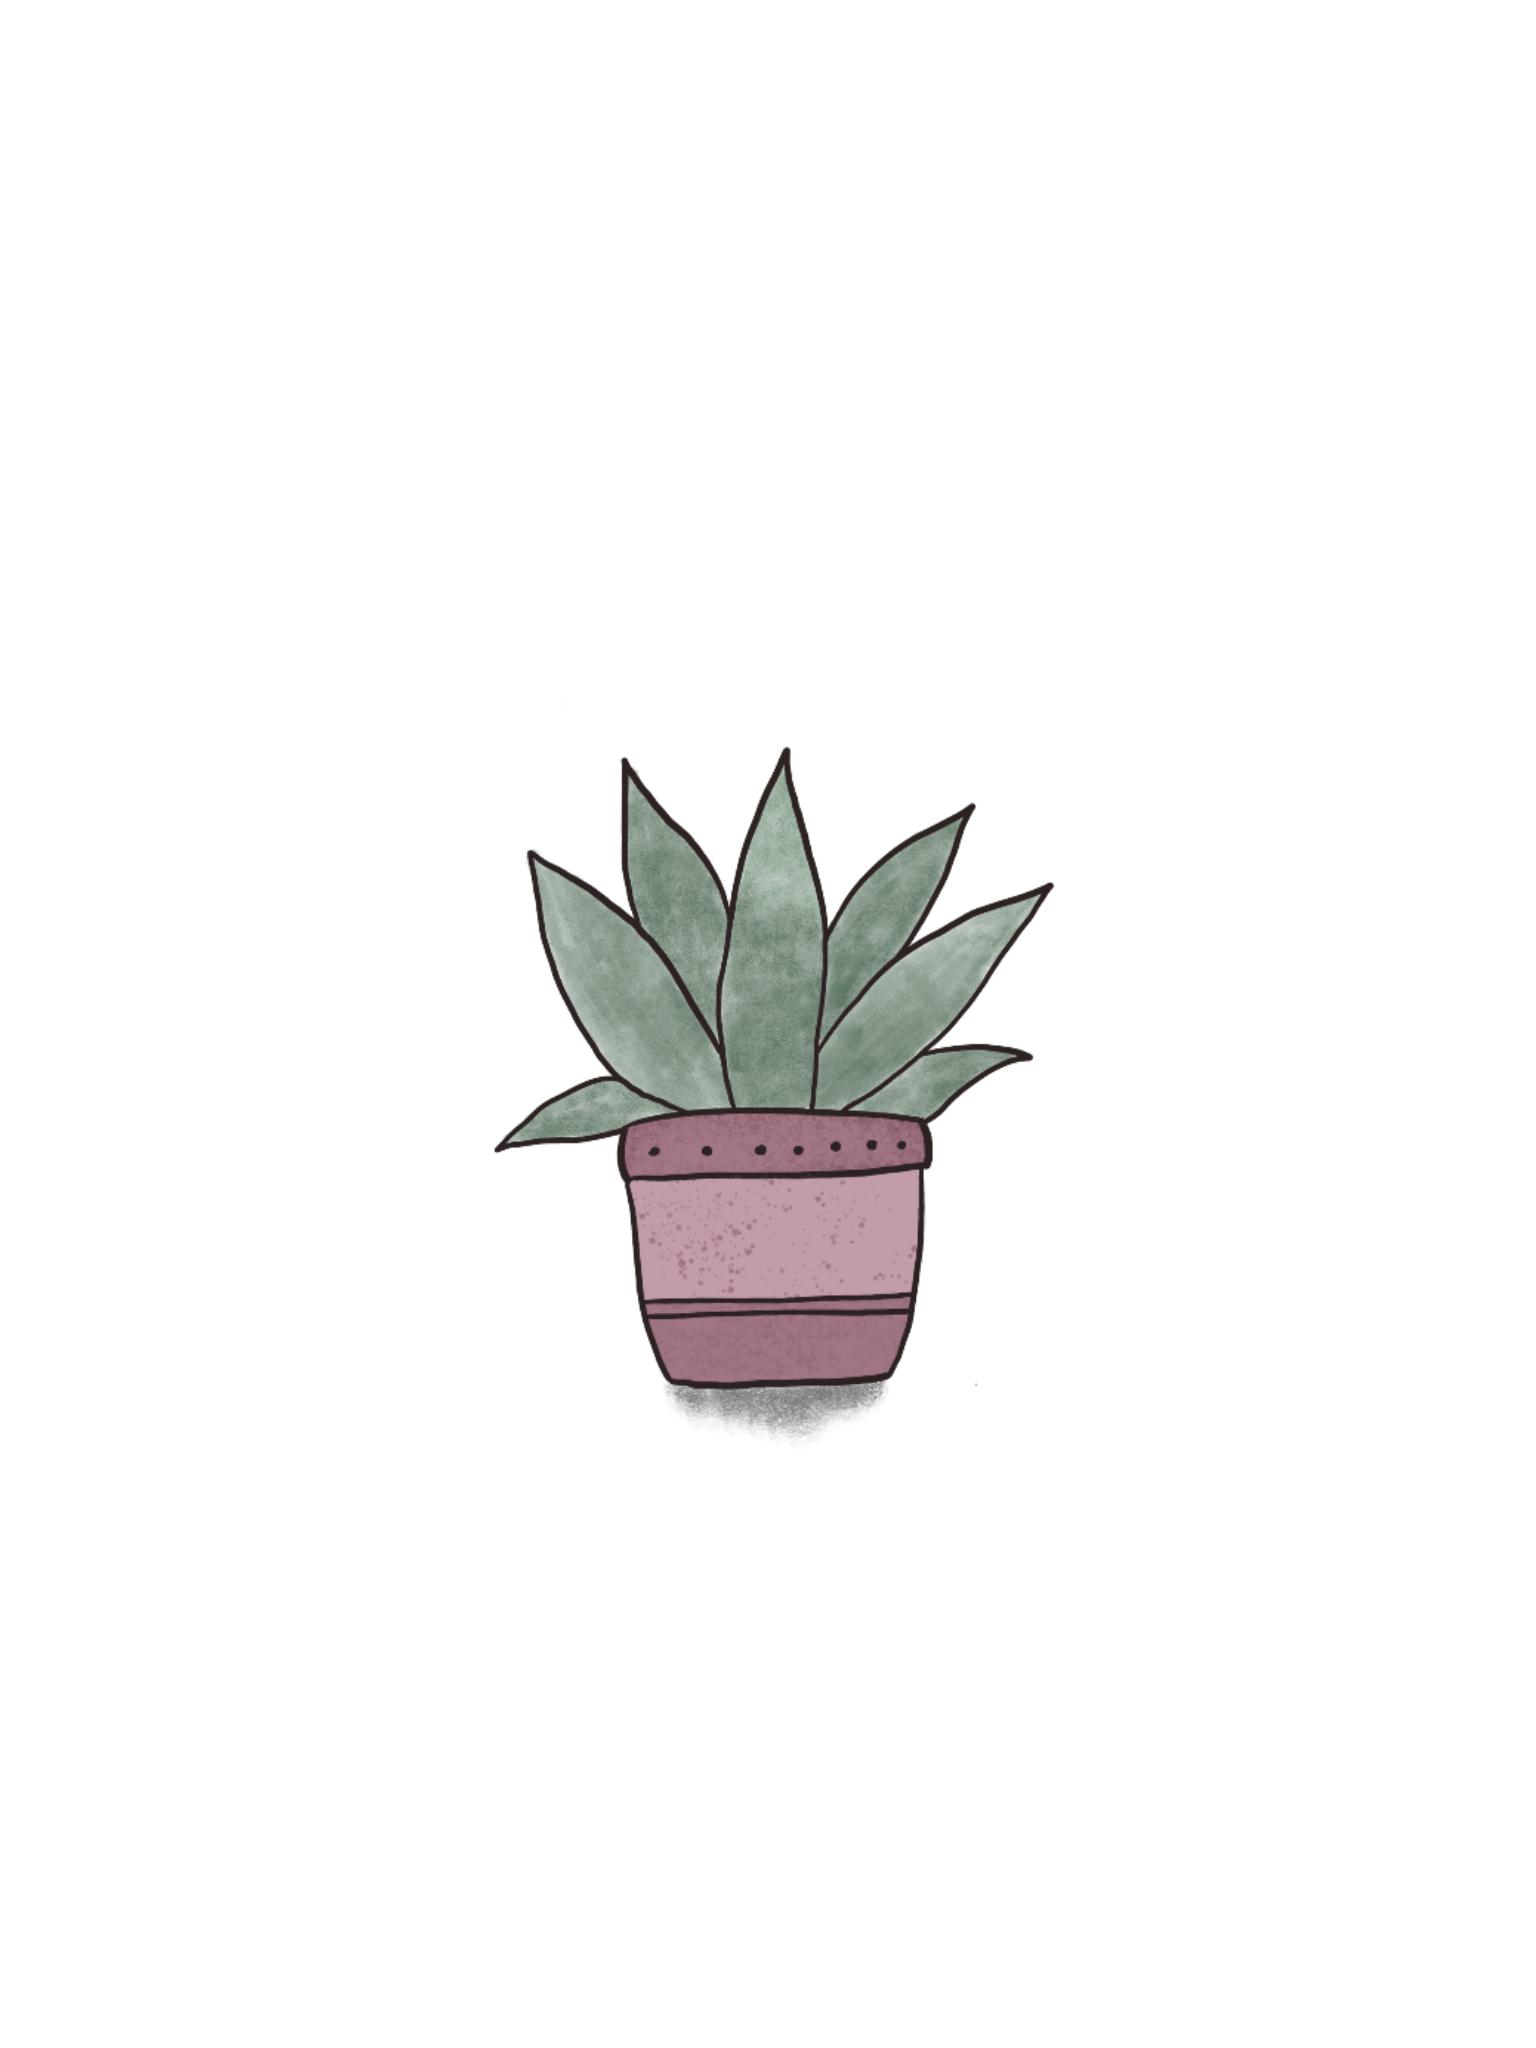 Minimalist Cactus Wallpapers Top Free Minimalist Cactus Backgrounds Wallpaperaccess